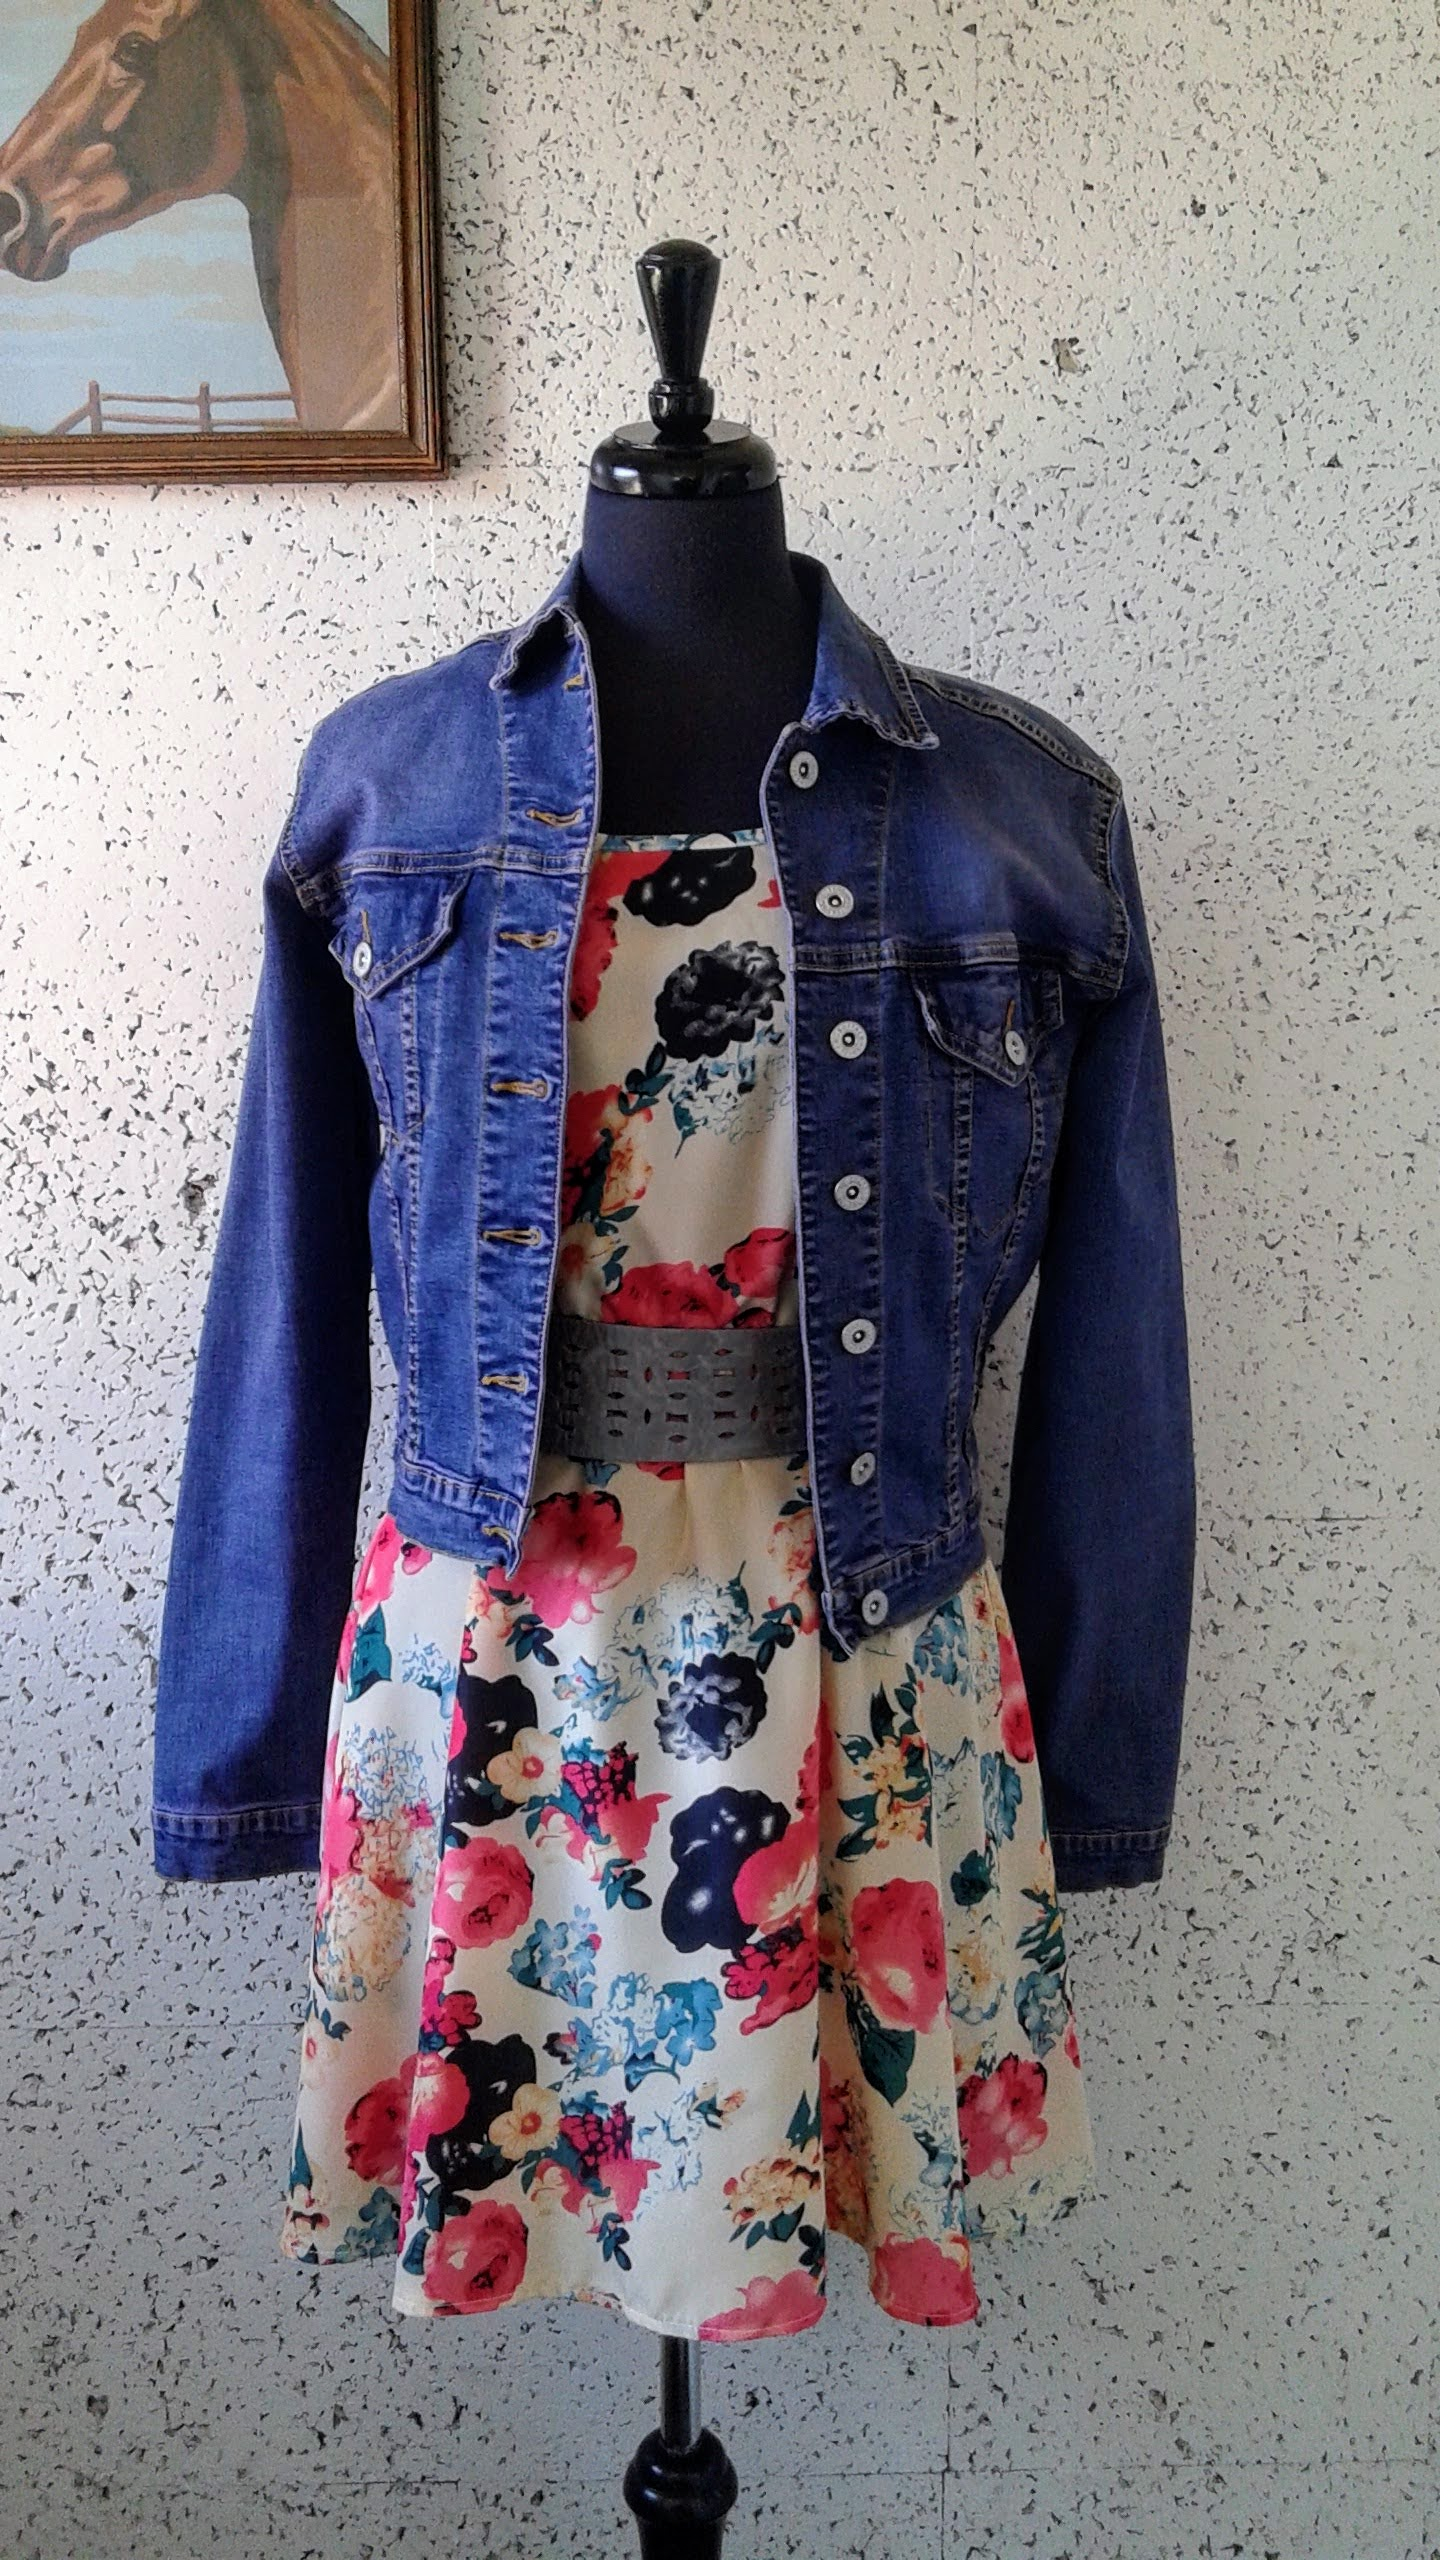 Buffalo denim jacket; Size S, $26. Lava Girl dress; Size M, $22; Ada belt, $40